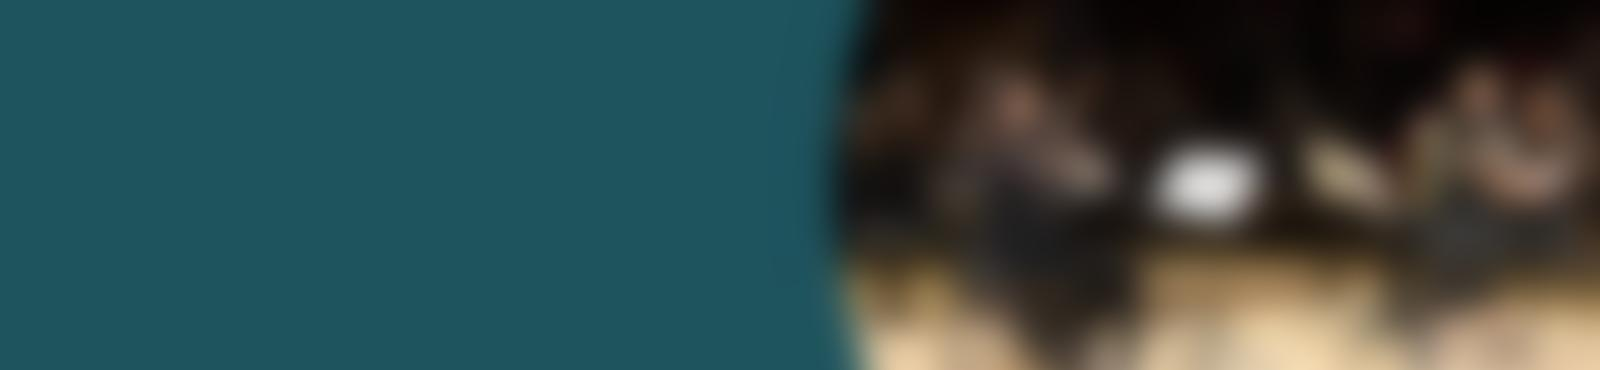 Blurred 37c440c2 74ce 46f4 8836 72180d00c994